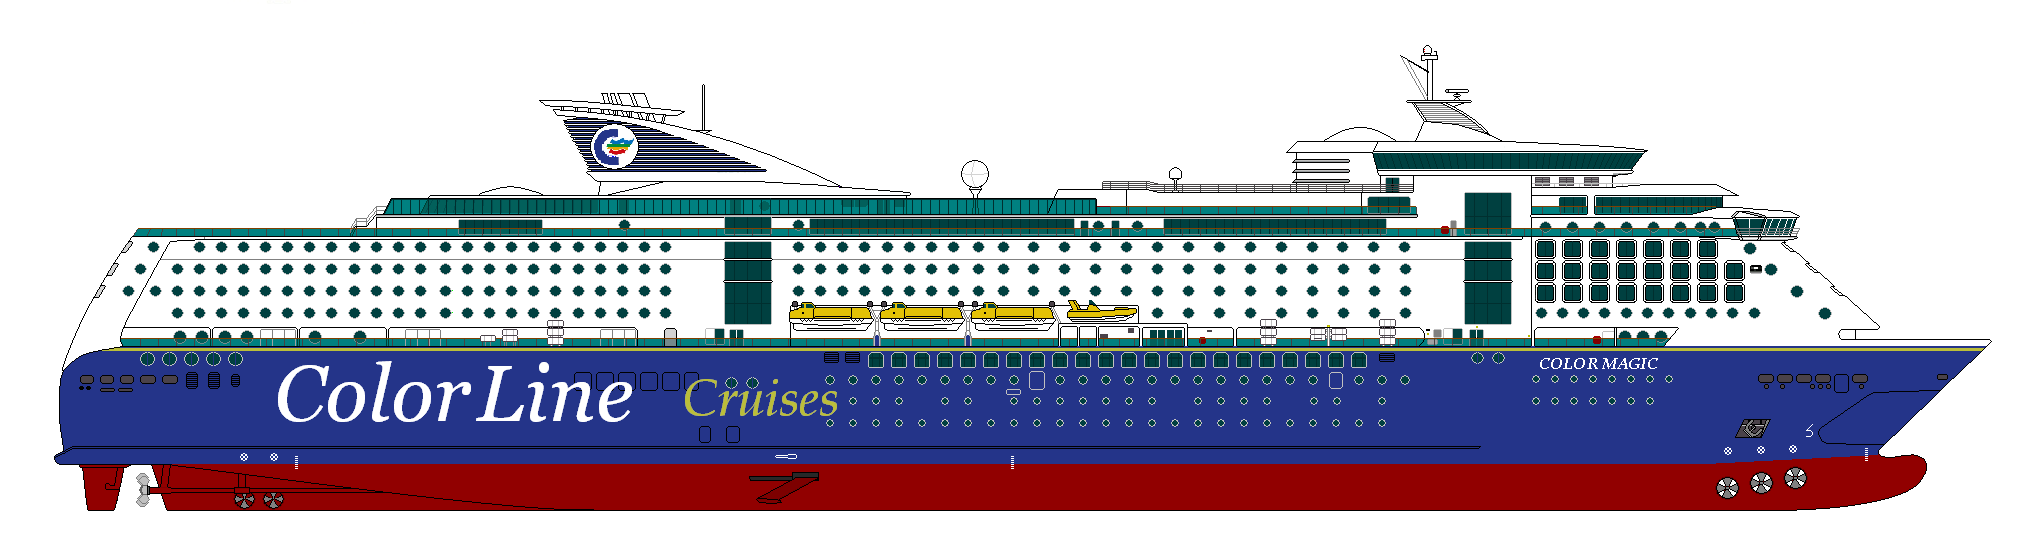 2038x550 My Ship Drawings.